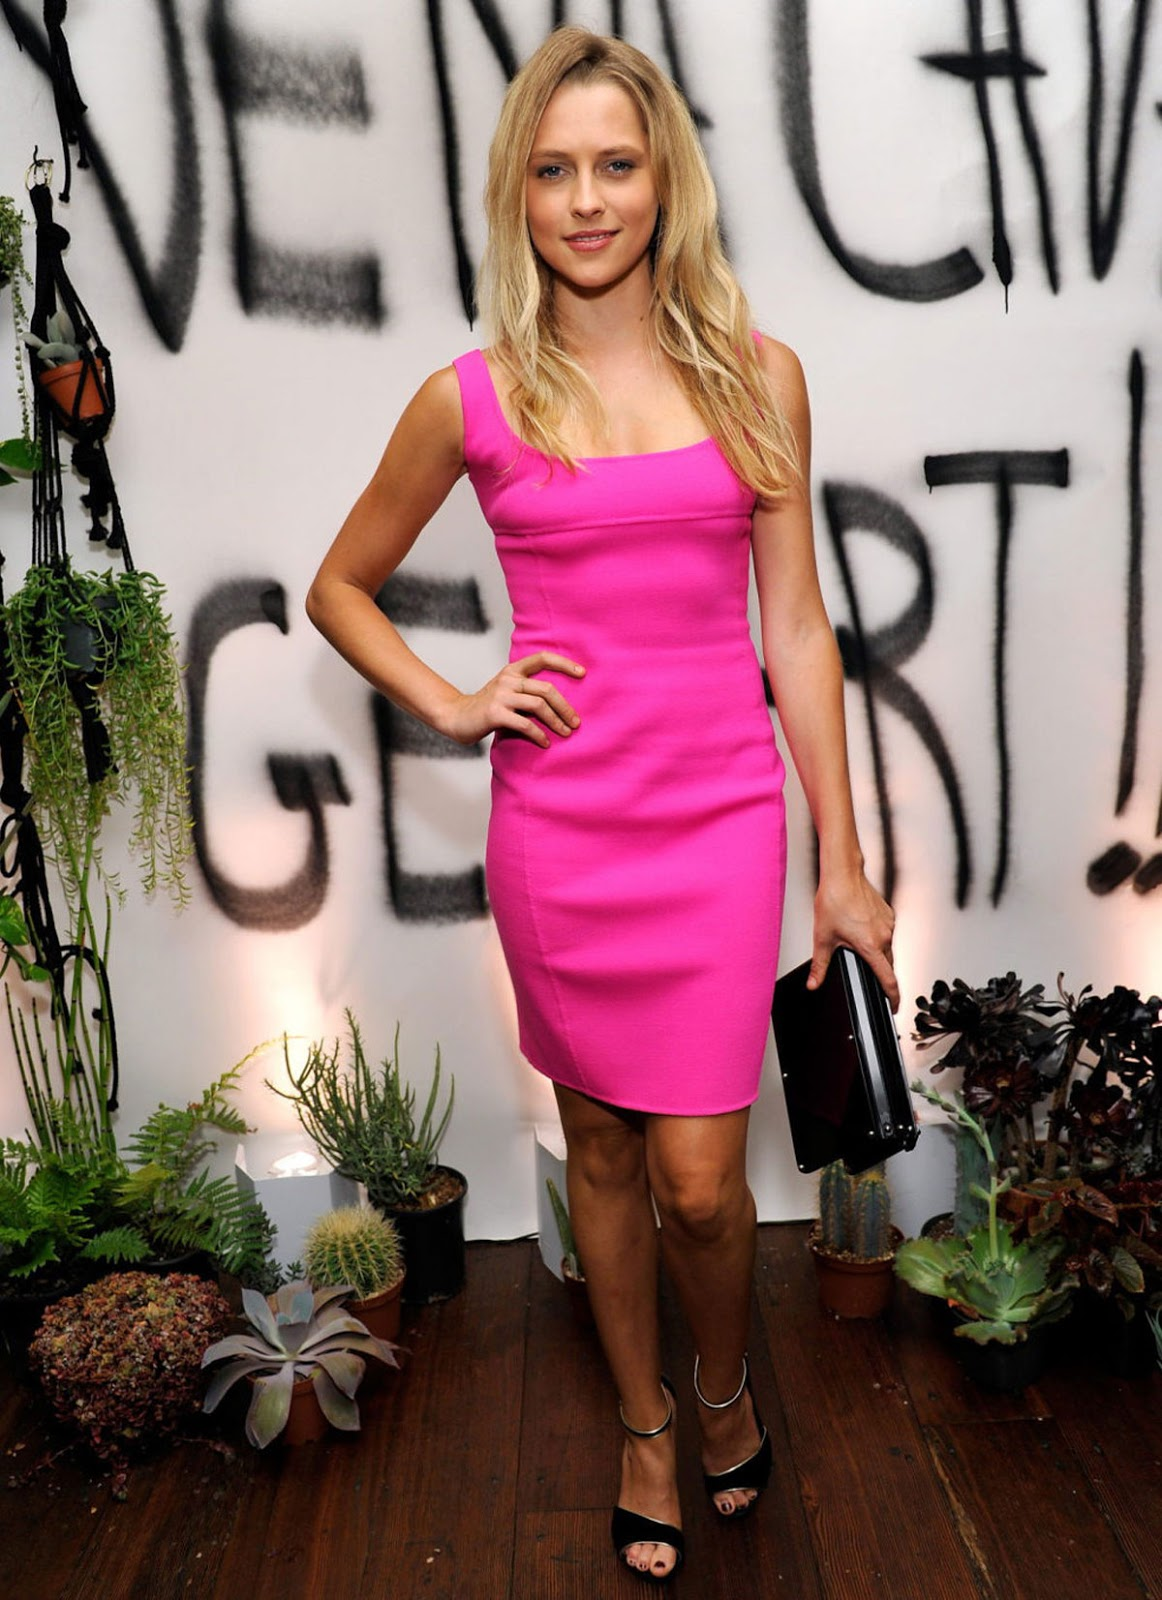 HQ Photos of Teresa Palmer in short mini pink dress At Genart Honors Alumni Vena Cava Party In Los Angeles